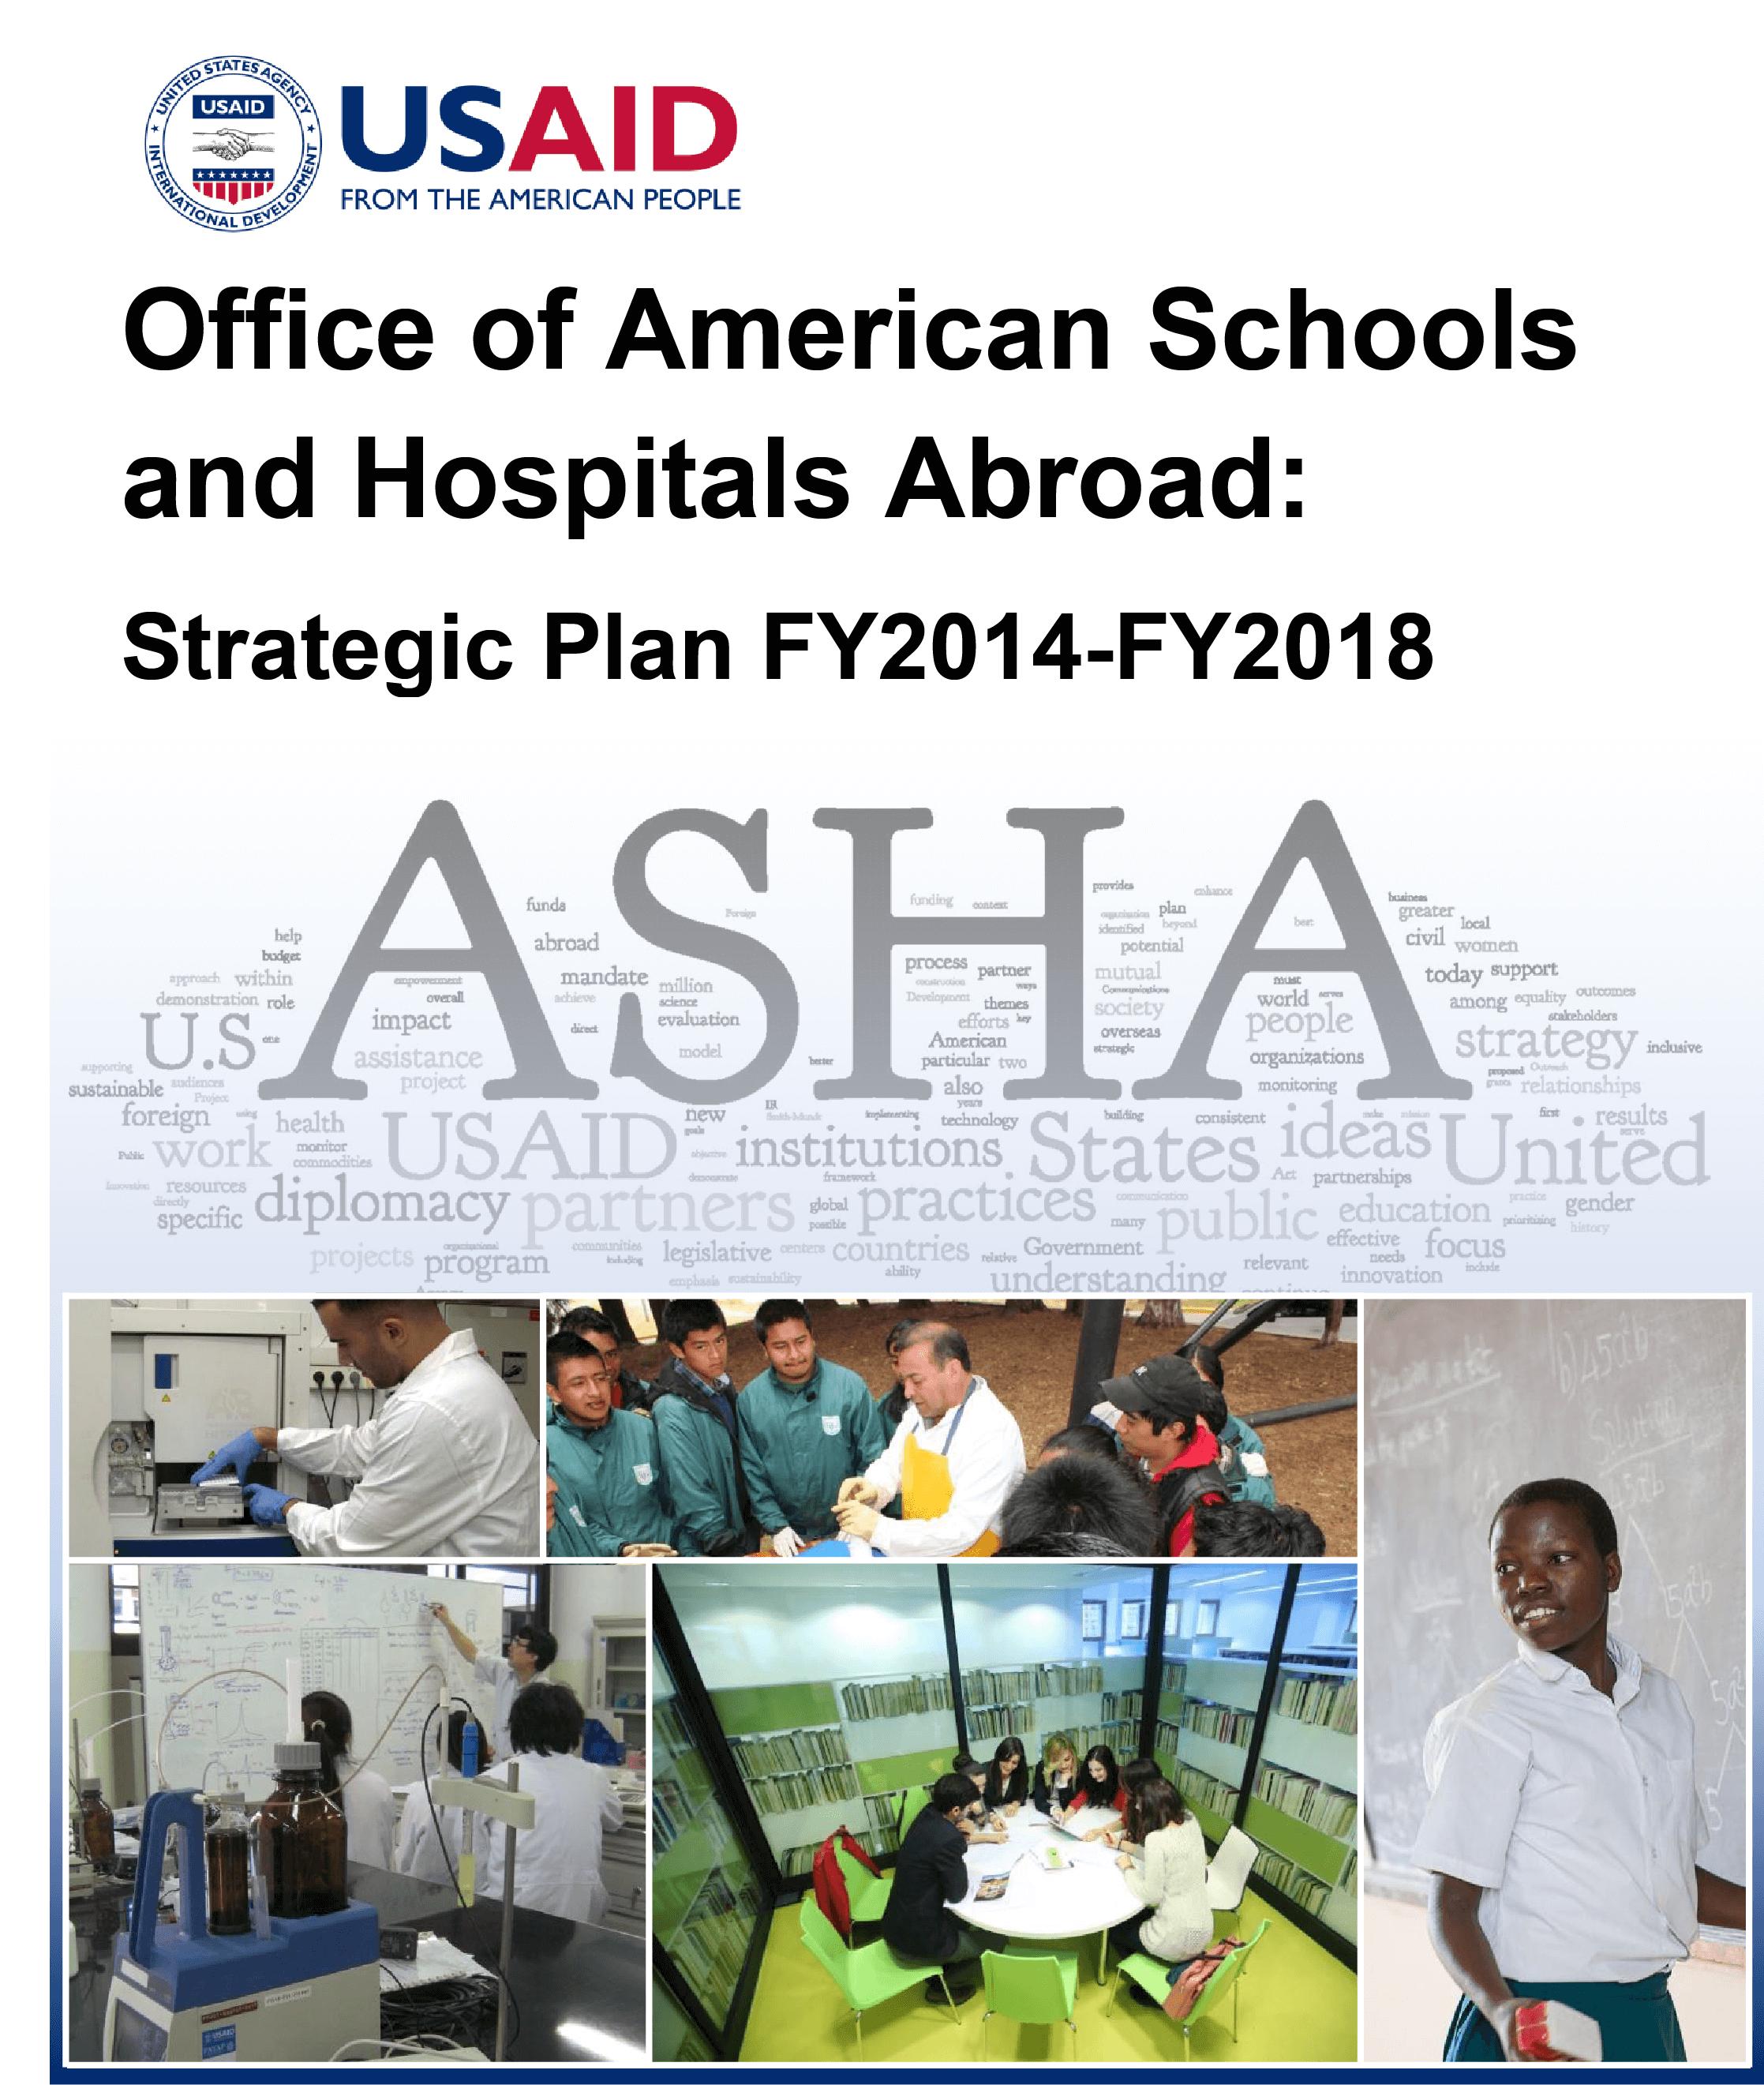 USAID/ASHA Strategic Plan for Fiscal Years 2014-2018